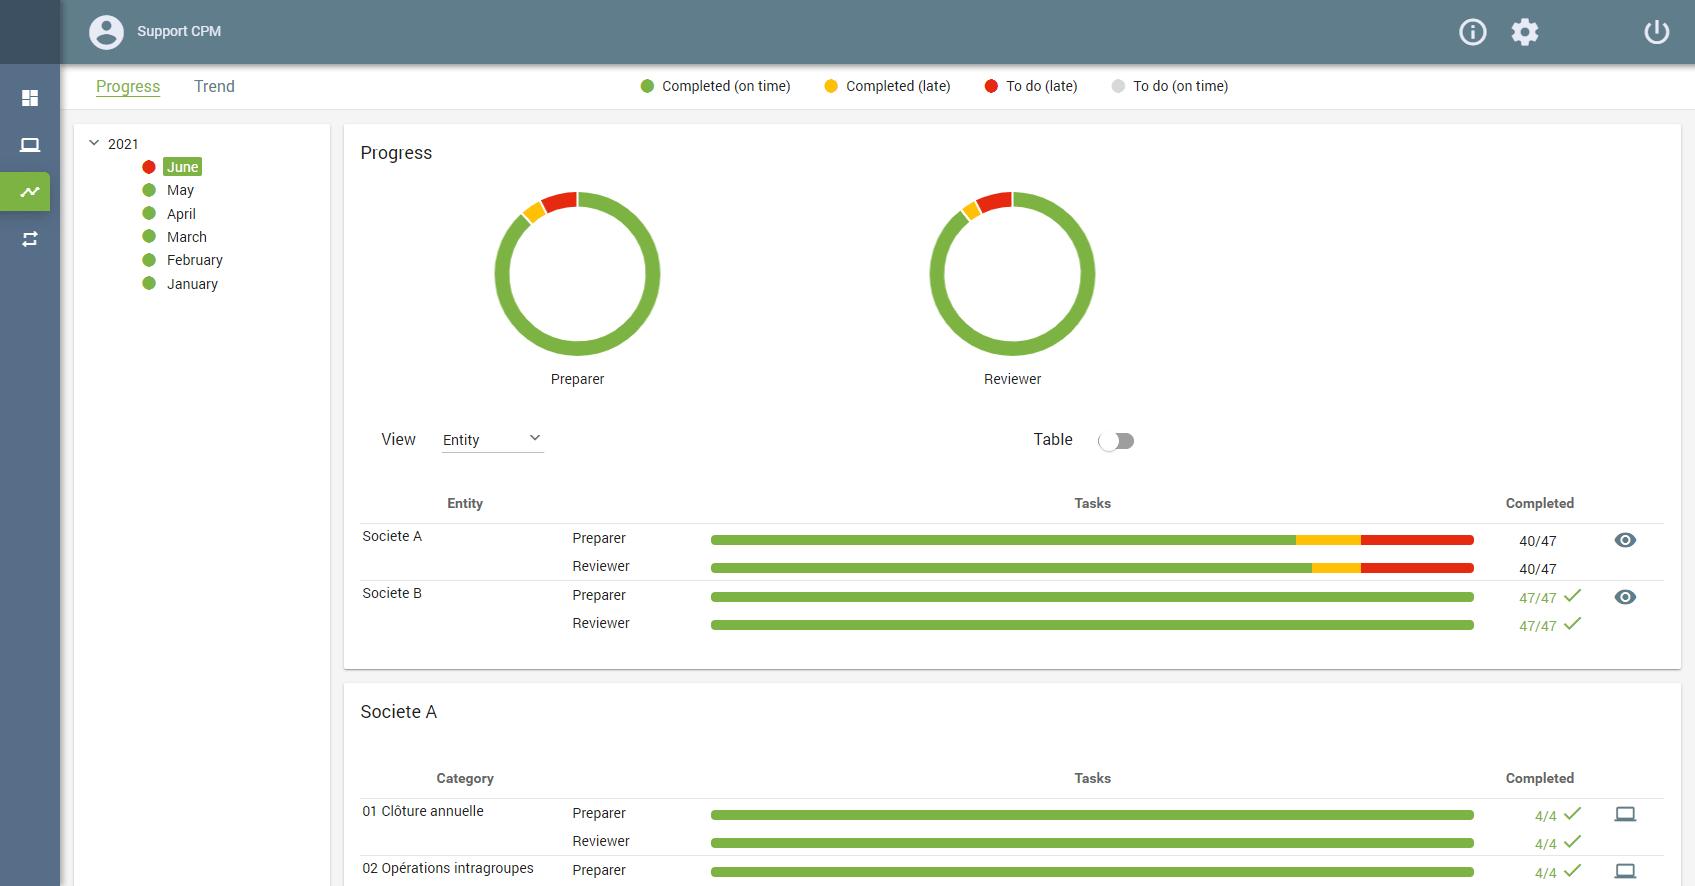 Visualize closing tasks progress